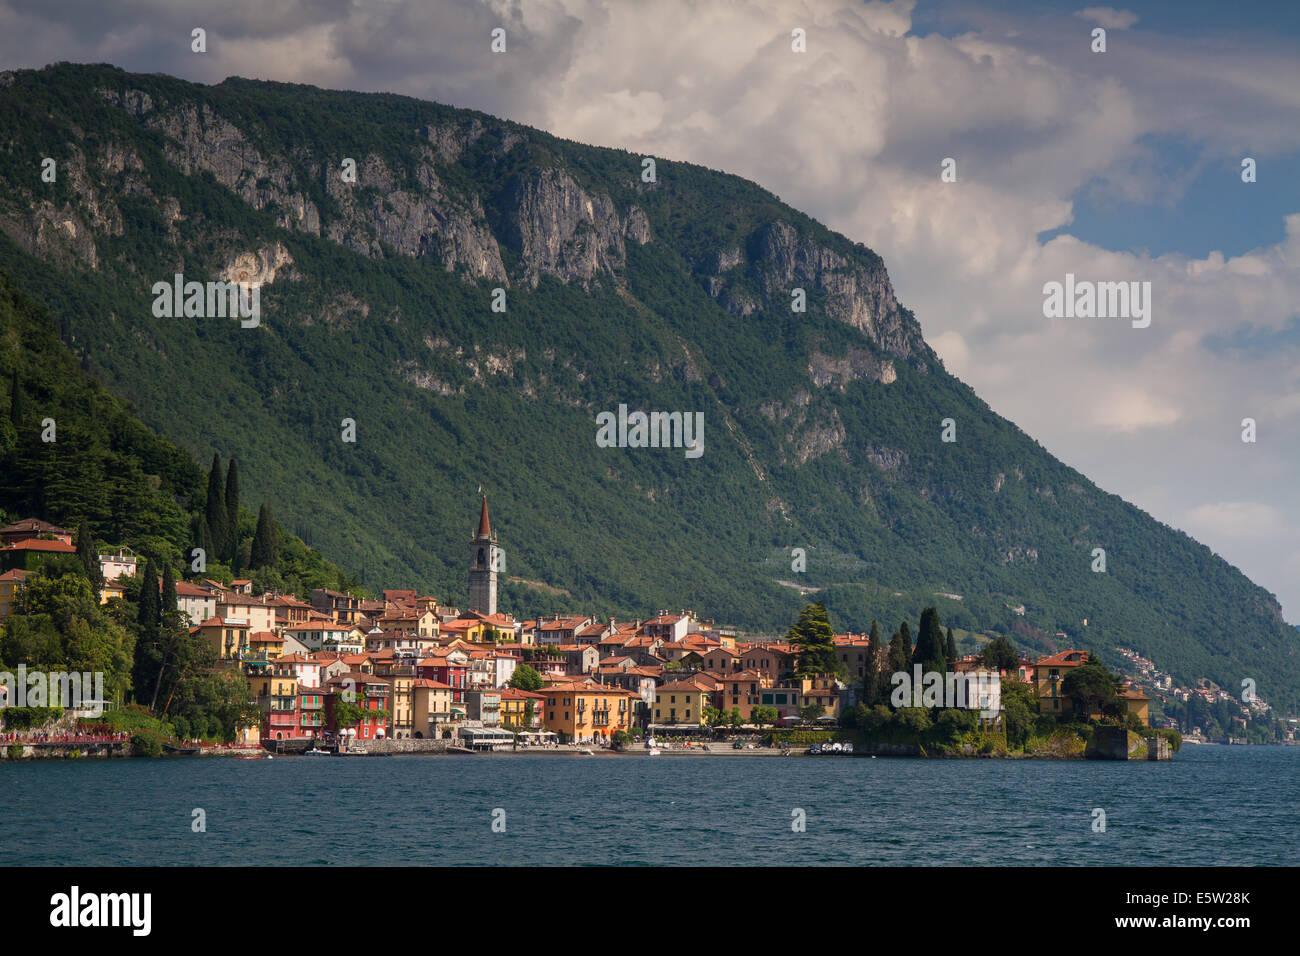 Varenna at Lake Como, Lombardy, Italy - Stock Image